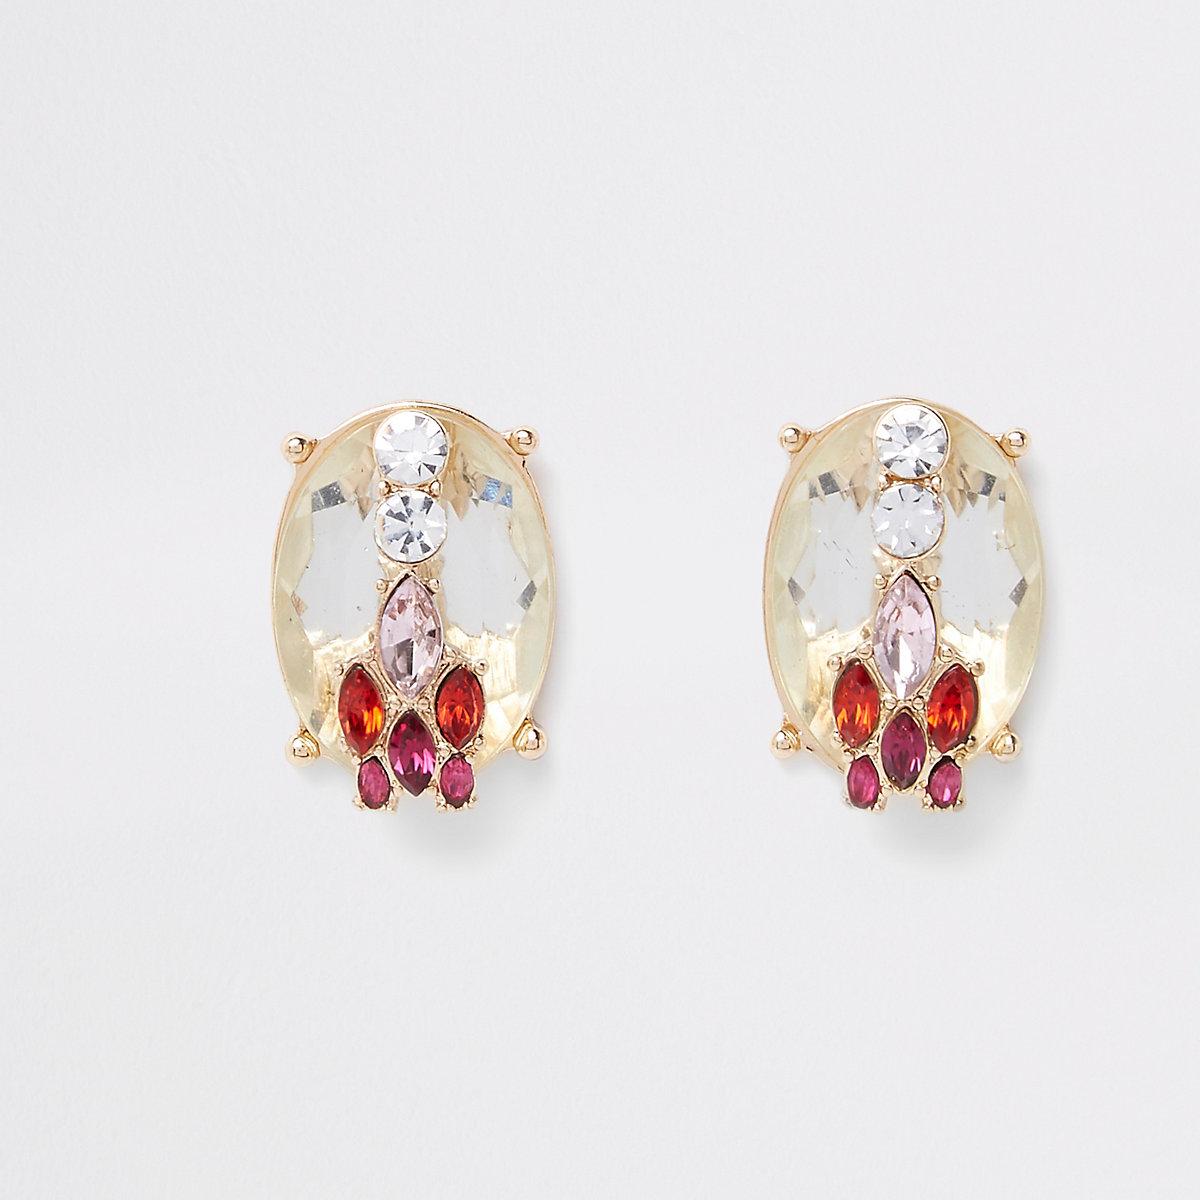 Gold tone layered jewel stone stud earrings